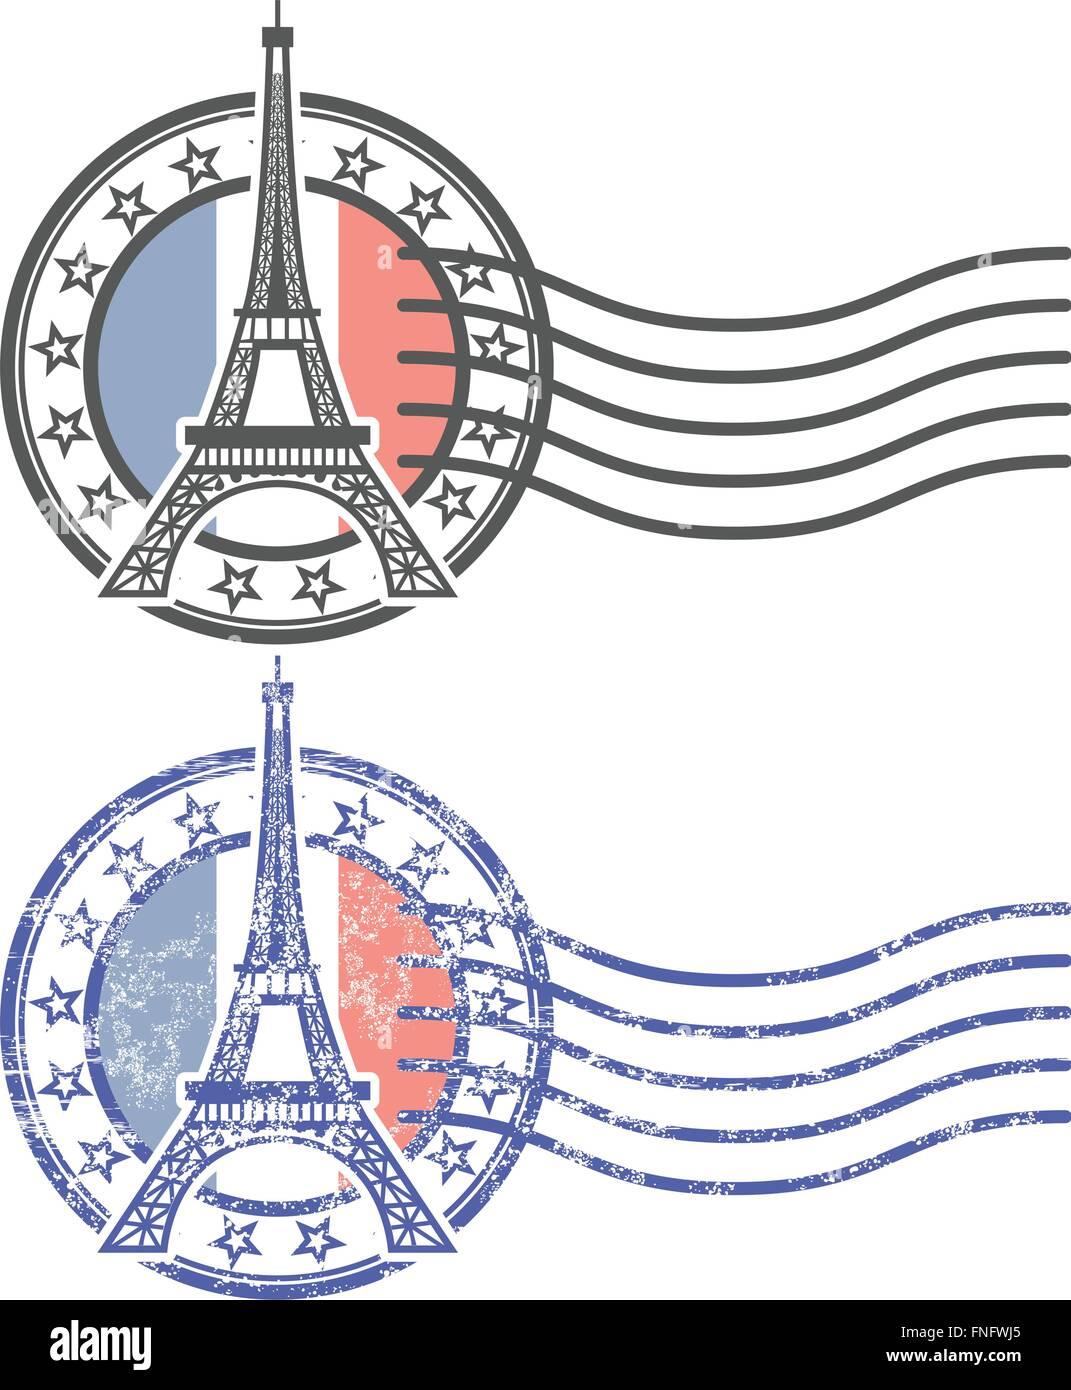 Grunge stamp with Eiffel Tower - landmark of Paris - Stock Vector